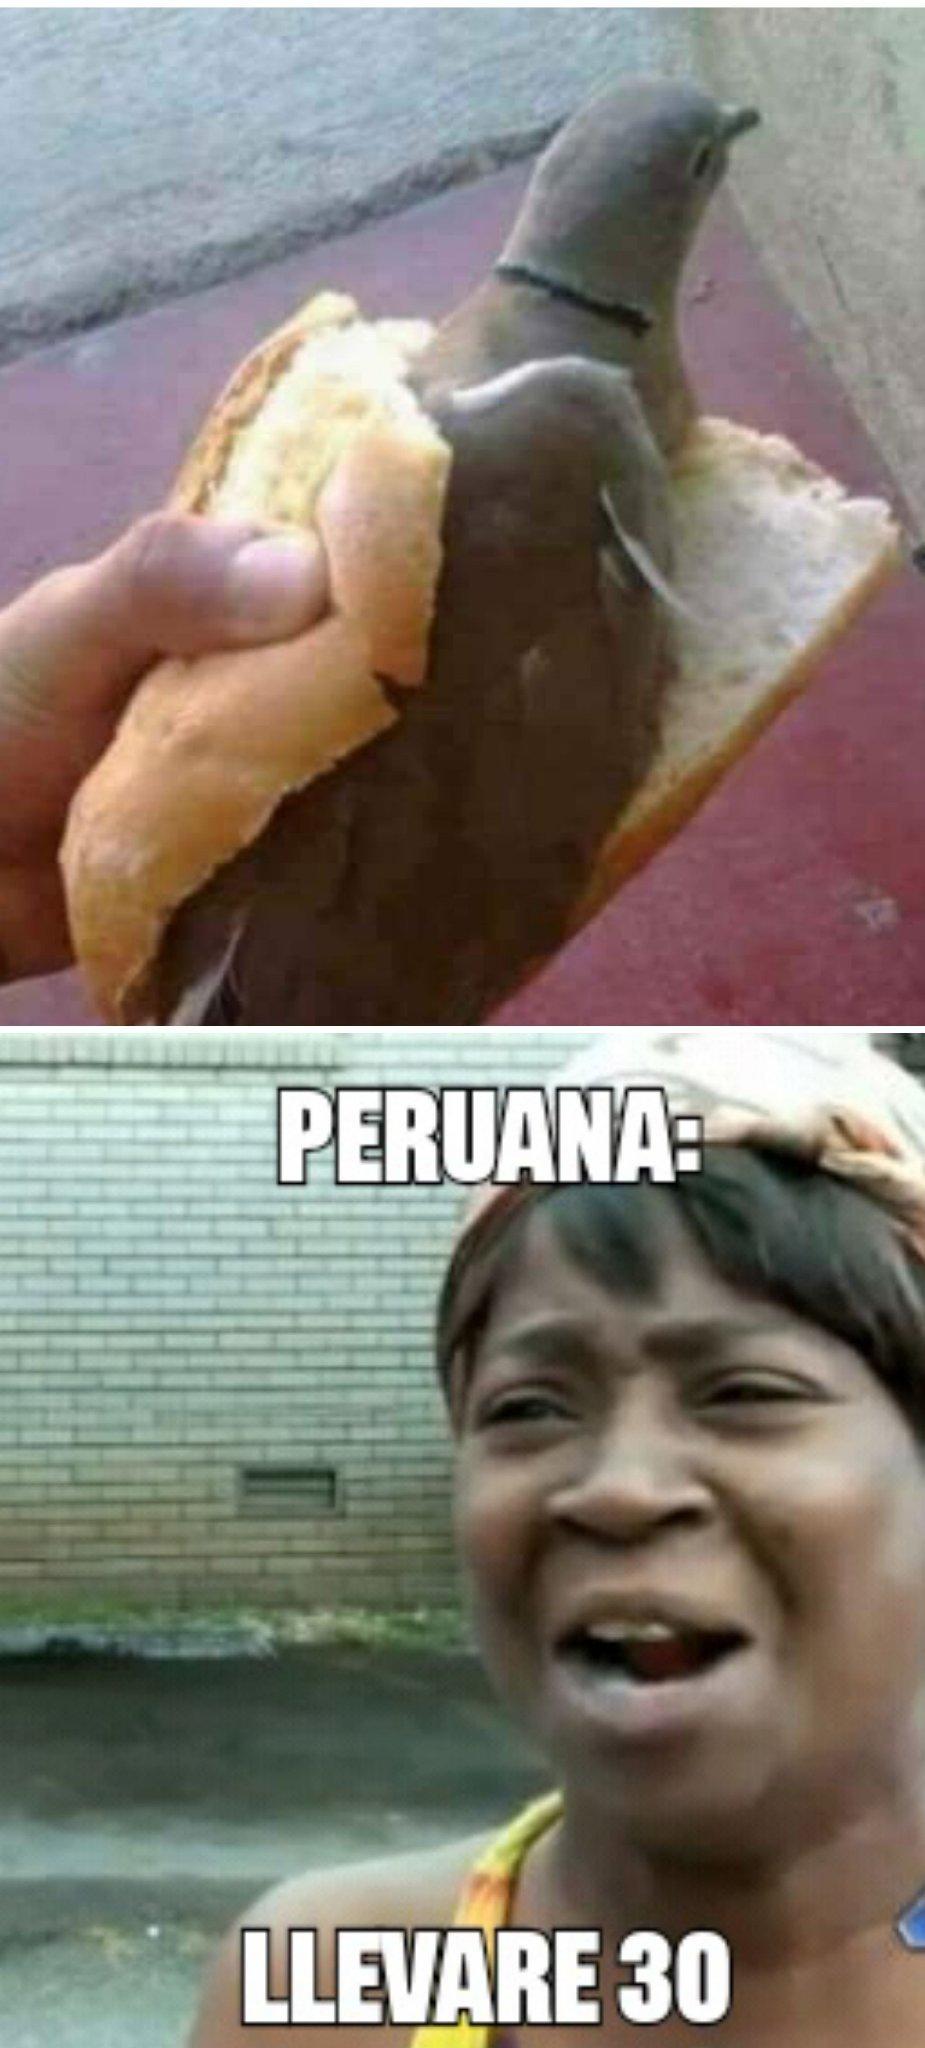 Gastronomia peruana - meme